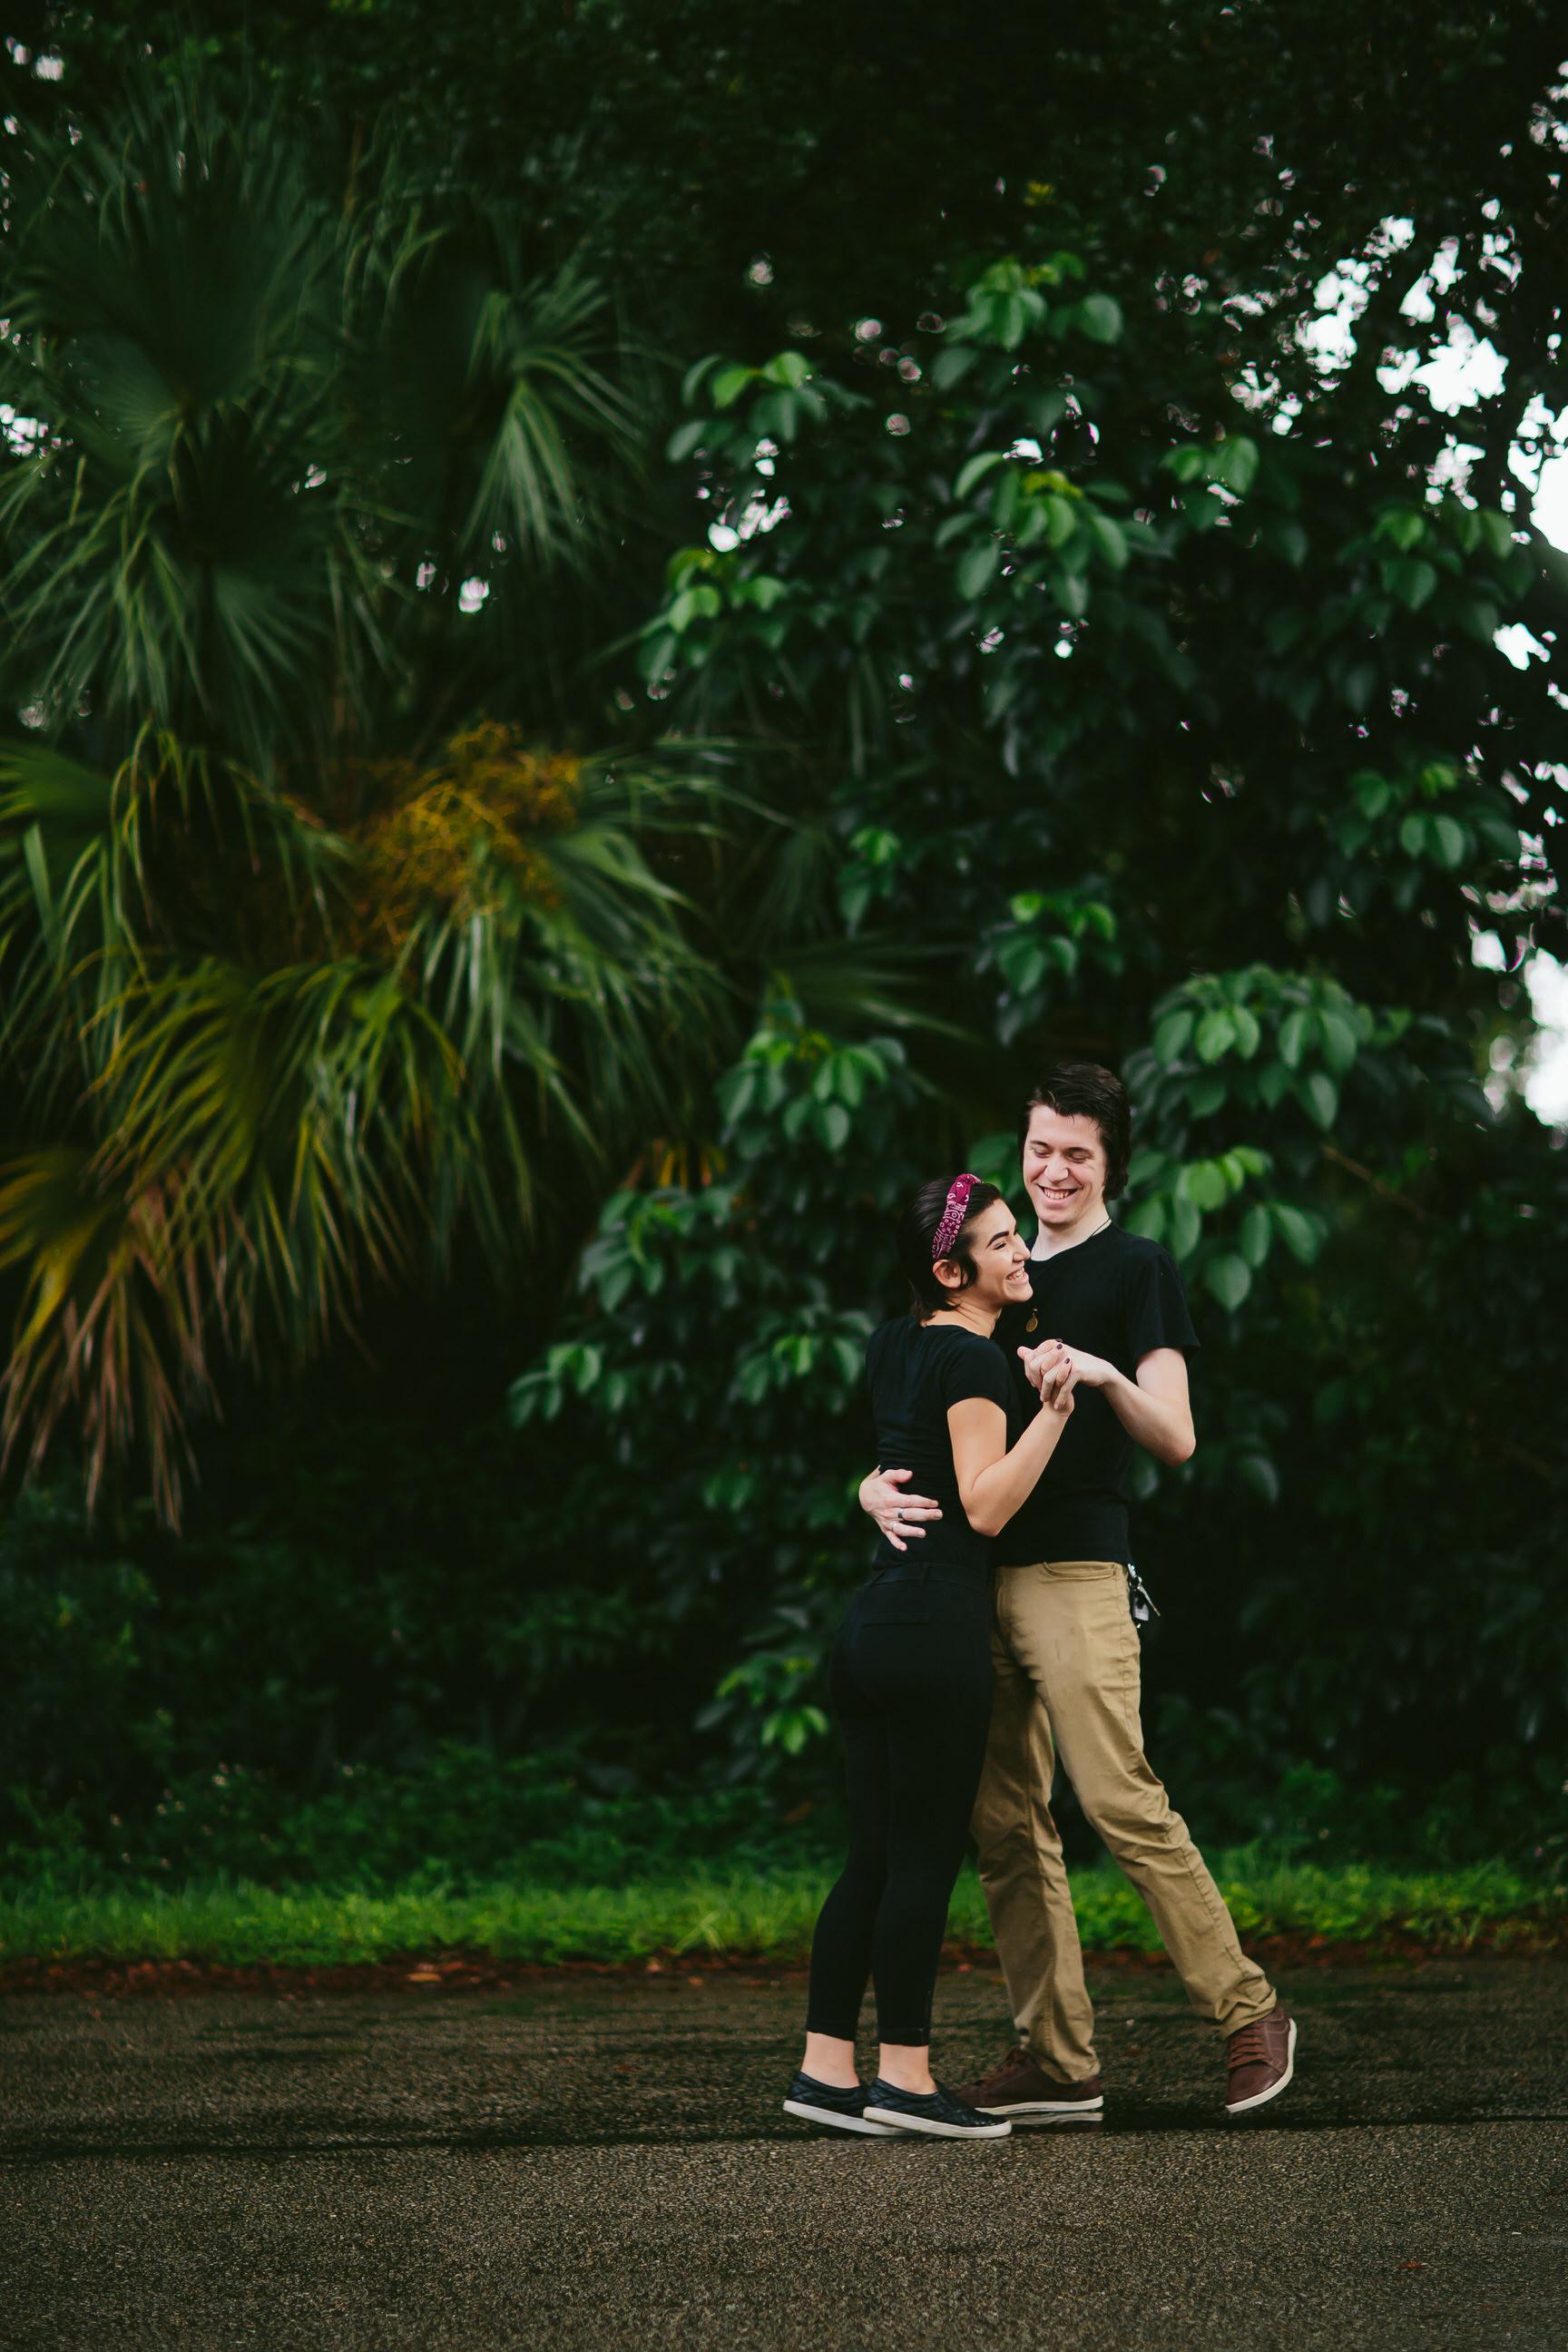 dancing-couple-nature-engaged-tiny-house-photo.jpg